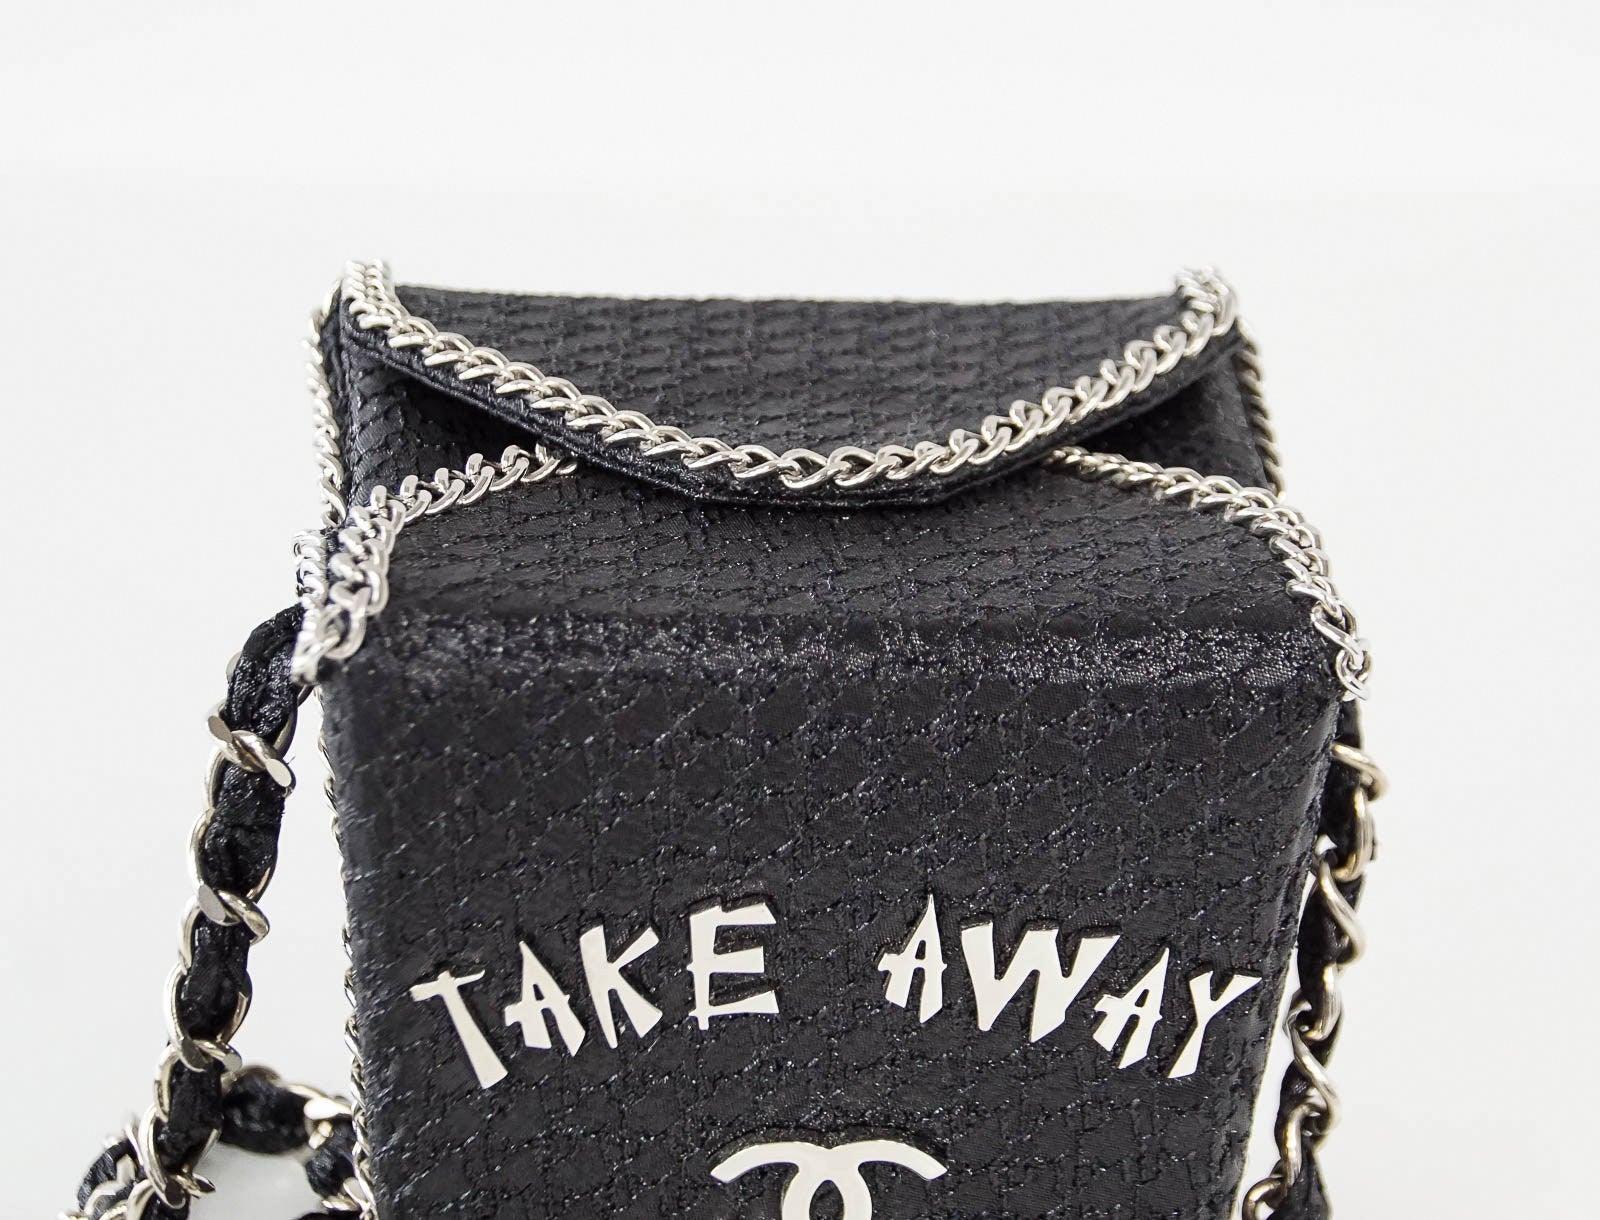 33fc571a5716 Chanel Take Away Box Bag Rare Limited Edition Runway Shanghai Collection at  1stdibs